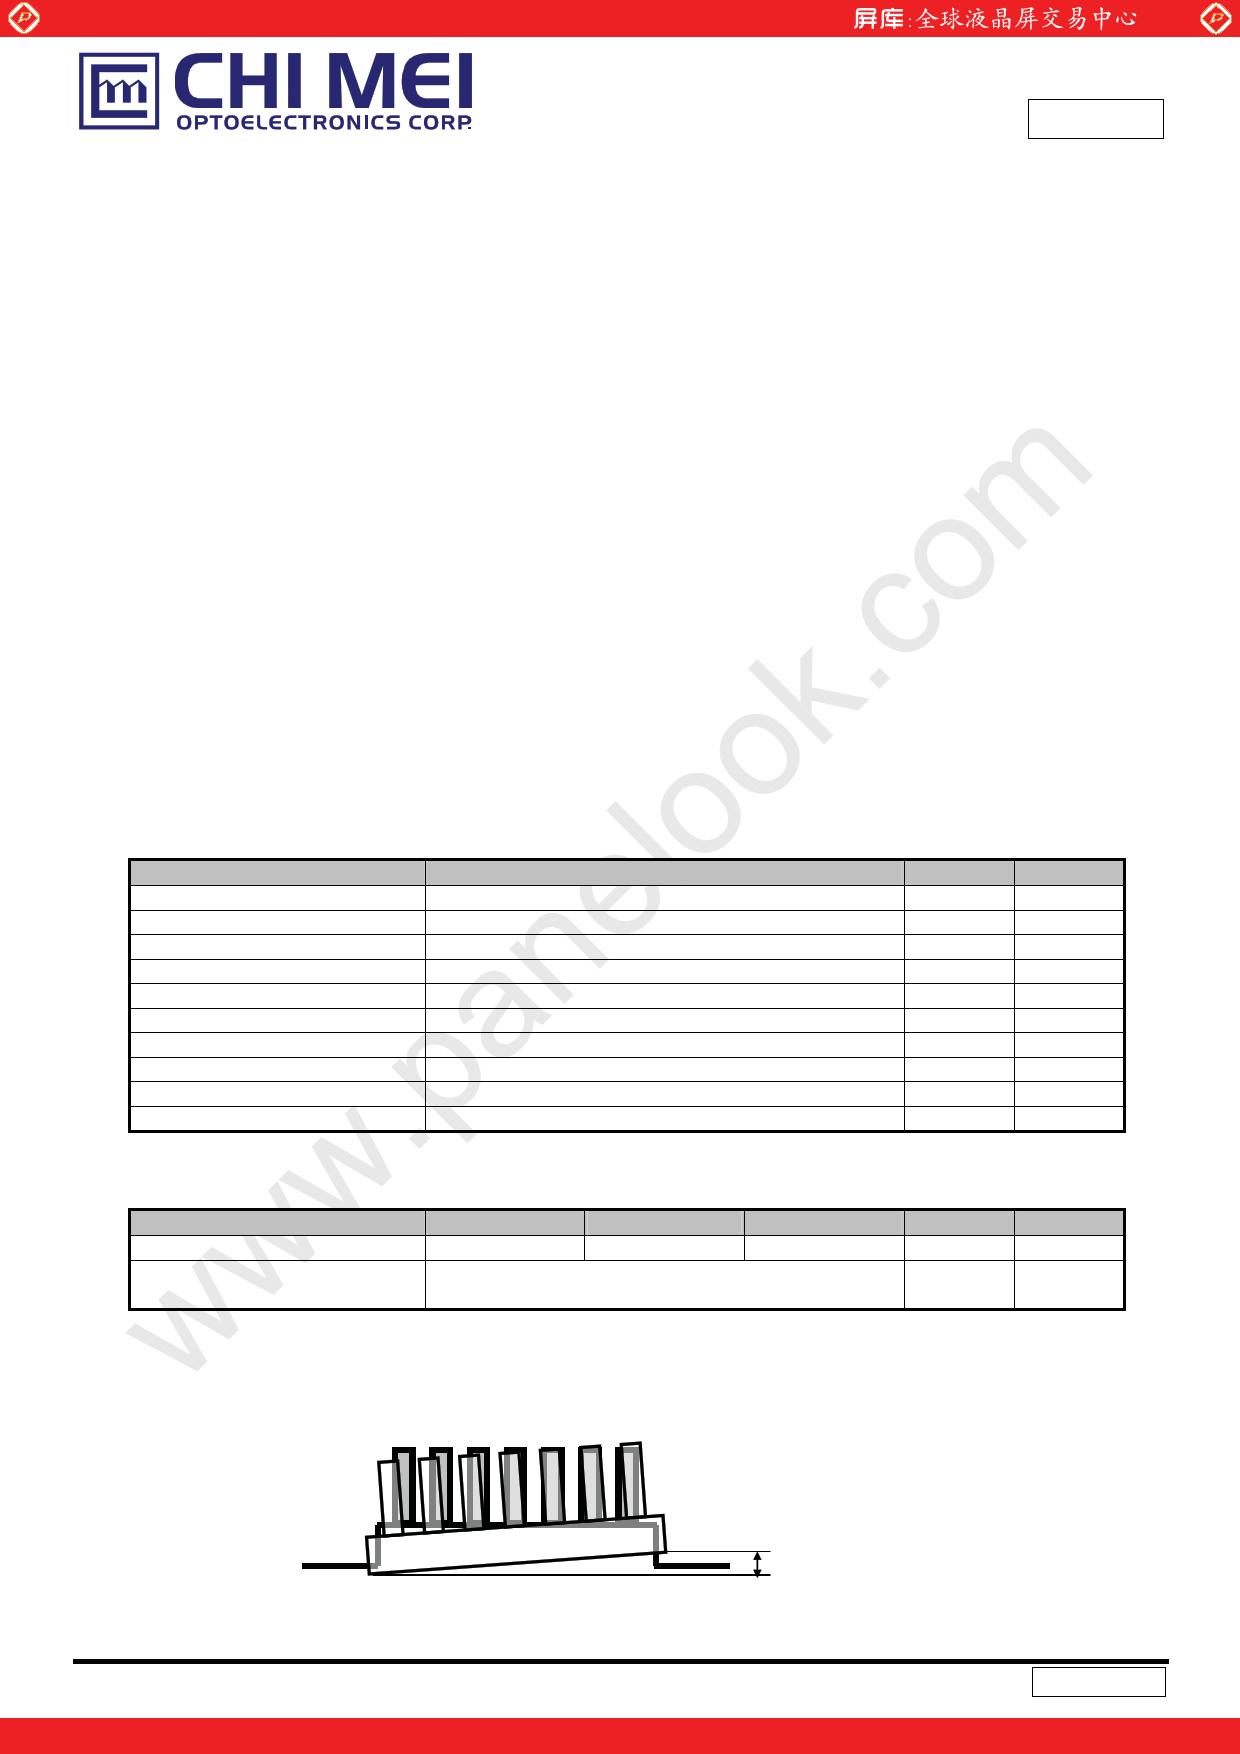 M215H1-P01 pdf, 반도체, 판매, 대치품